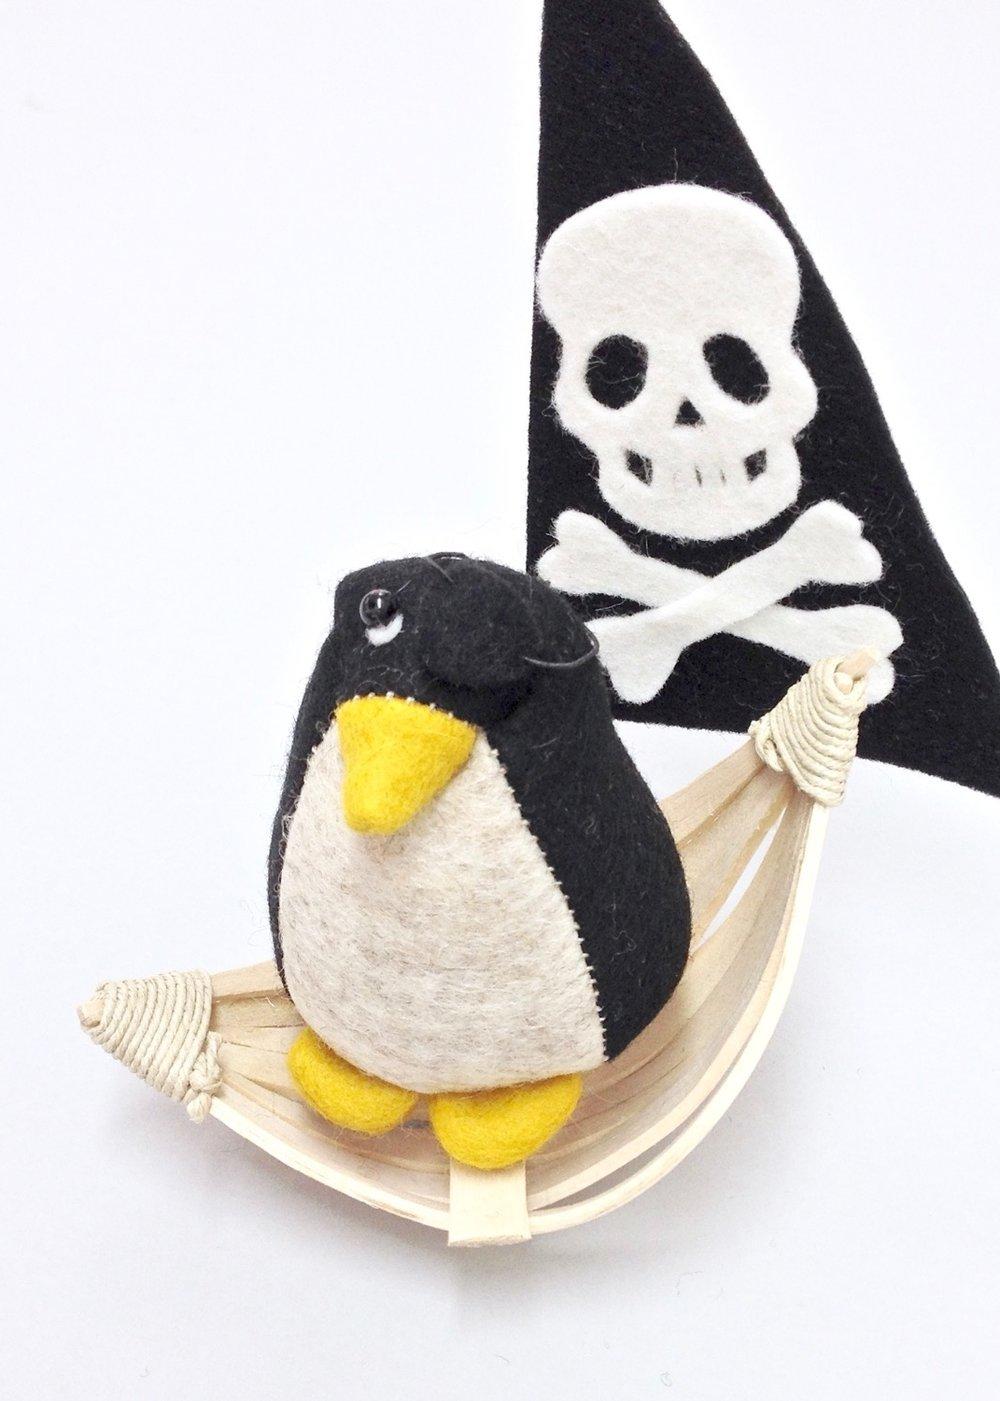 Pedro the Penguin wool felt Bilberry Woods character by Laura Mirjami